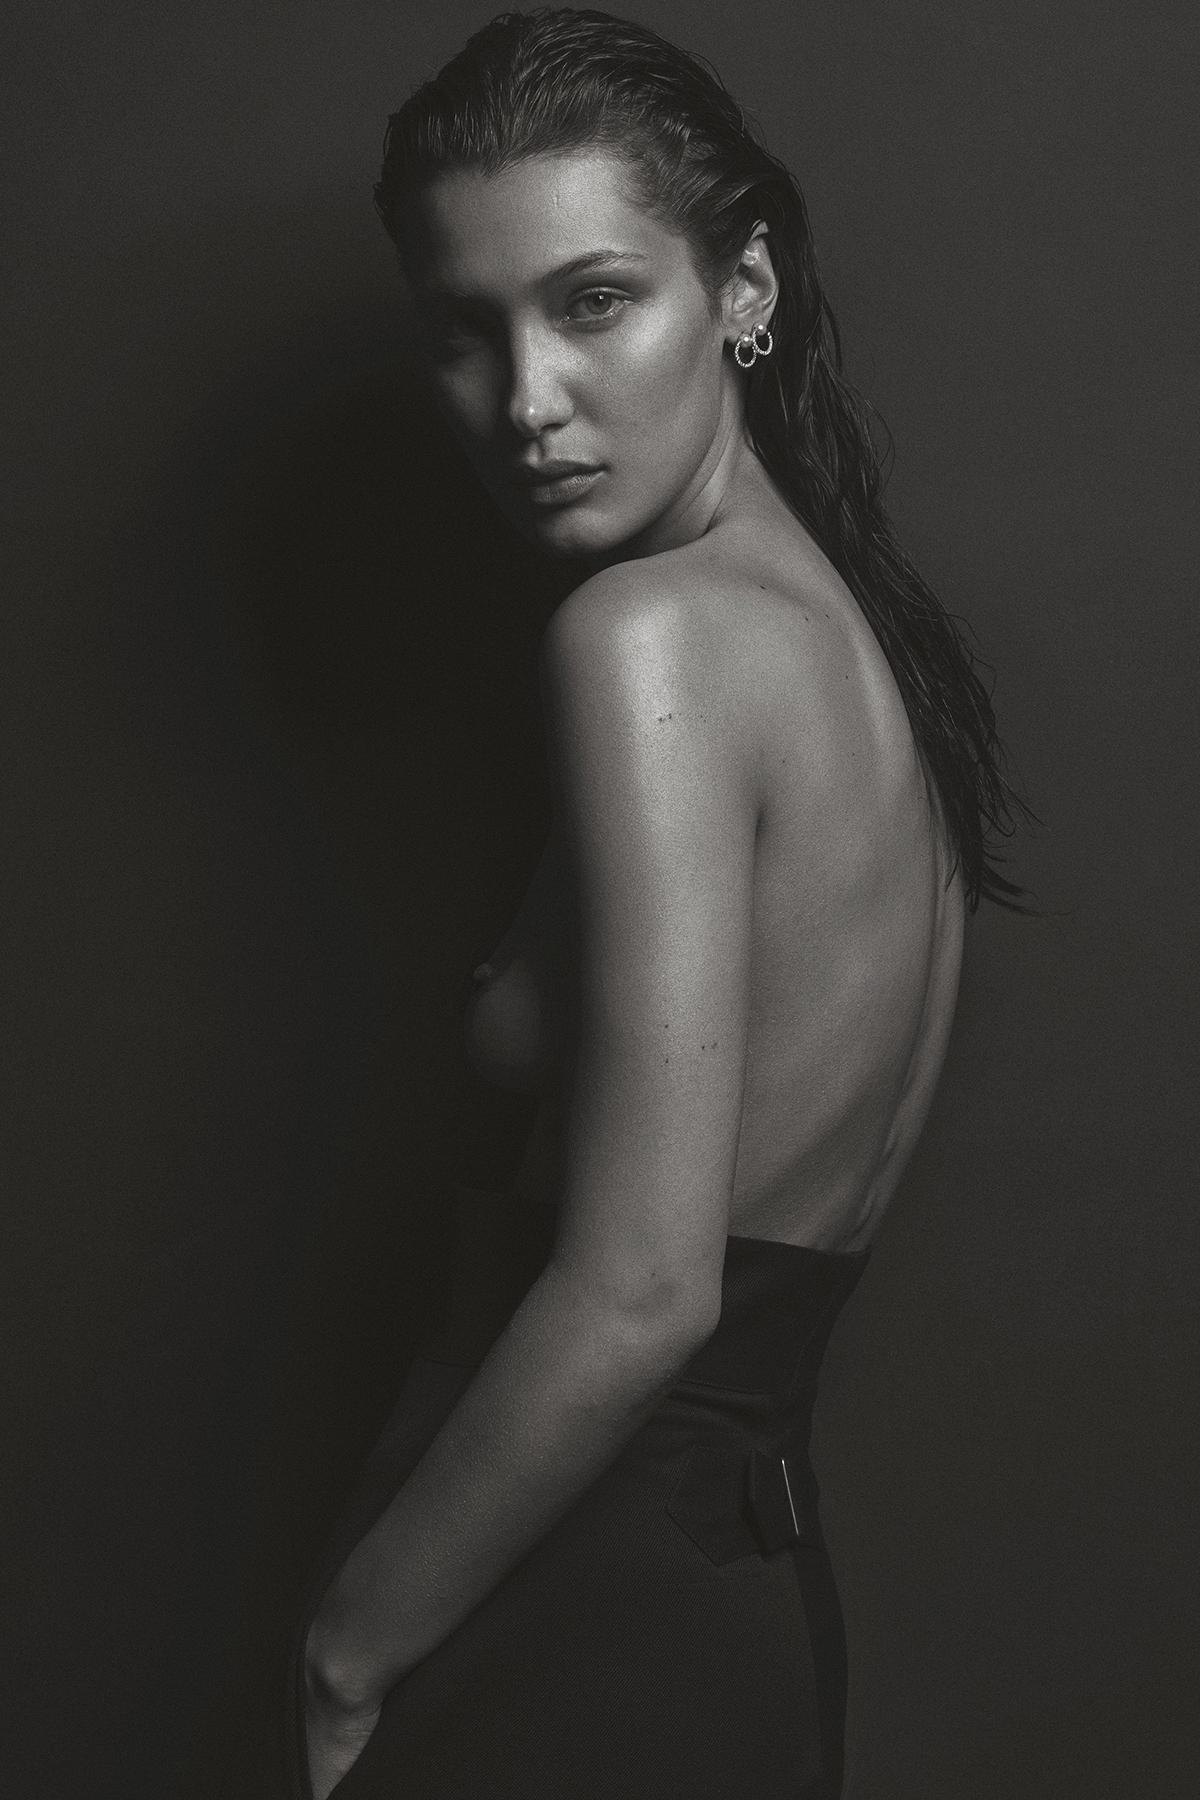 Bella Hadid Mario Sorrenti V Magazine 2017 March Issue